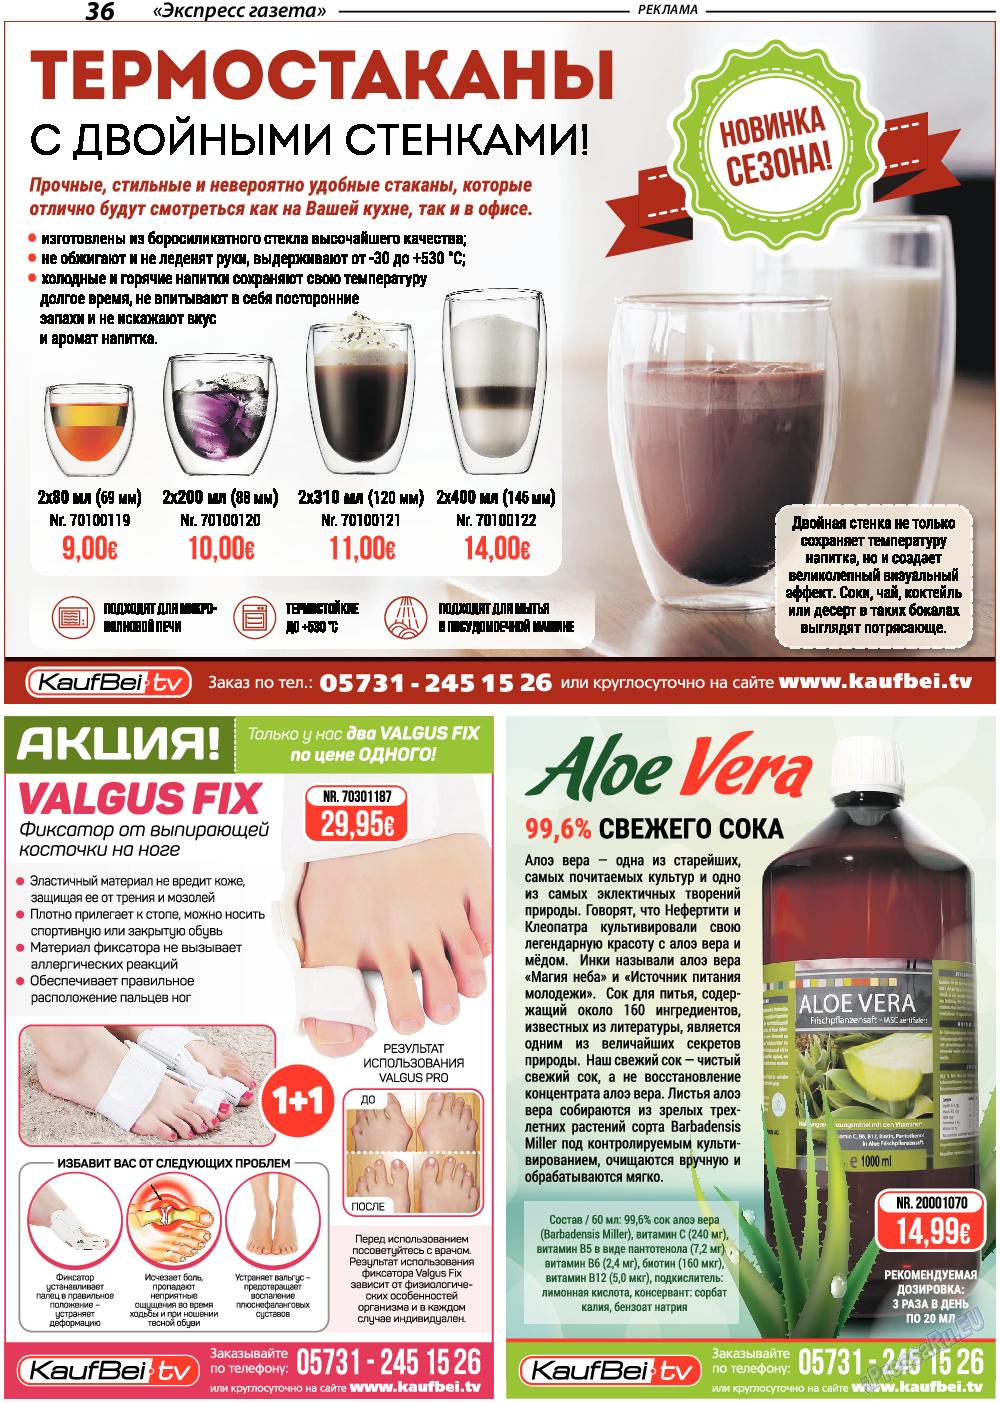 Экспресс газета (газета). 2018 год, номер 6, стр. 36